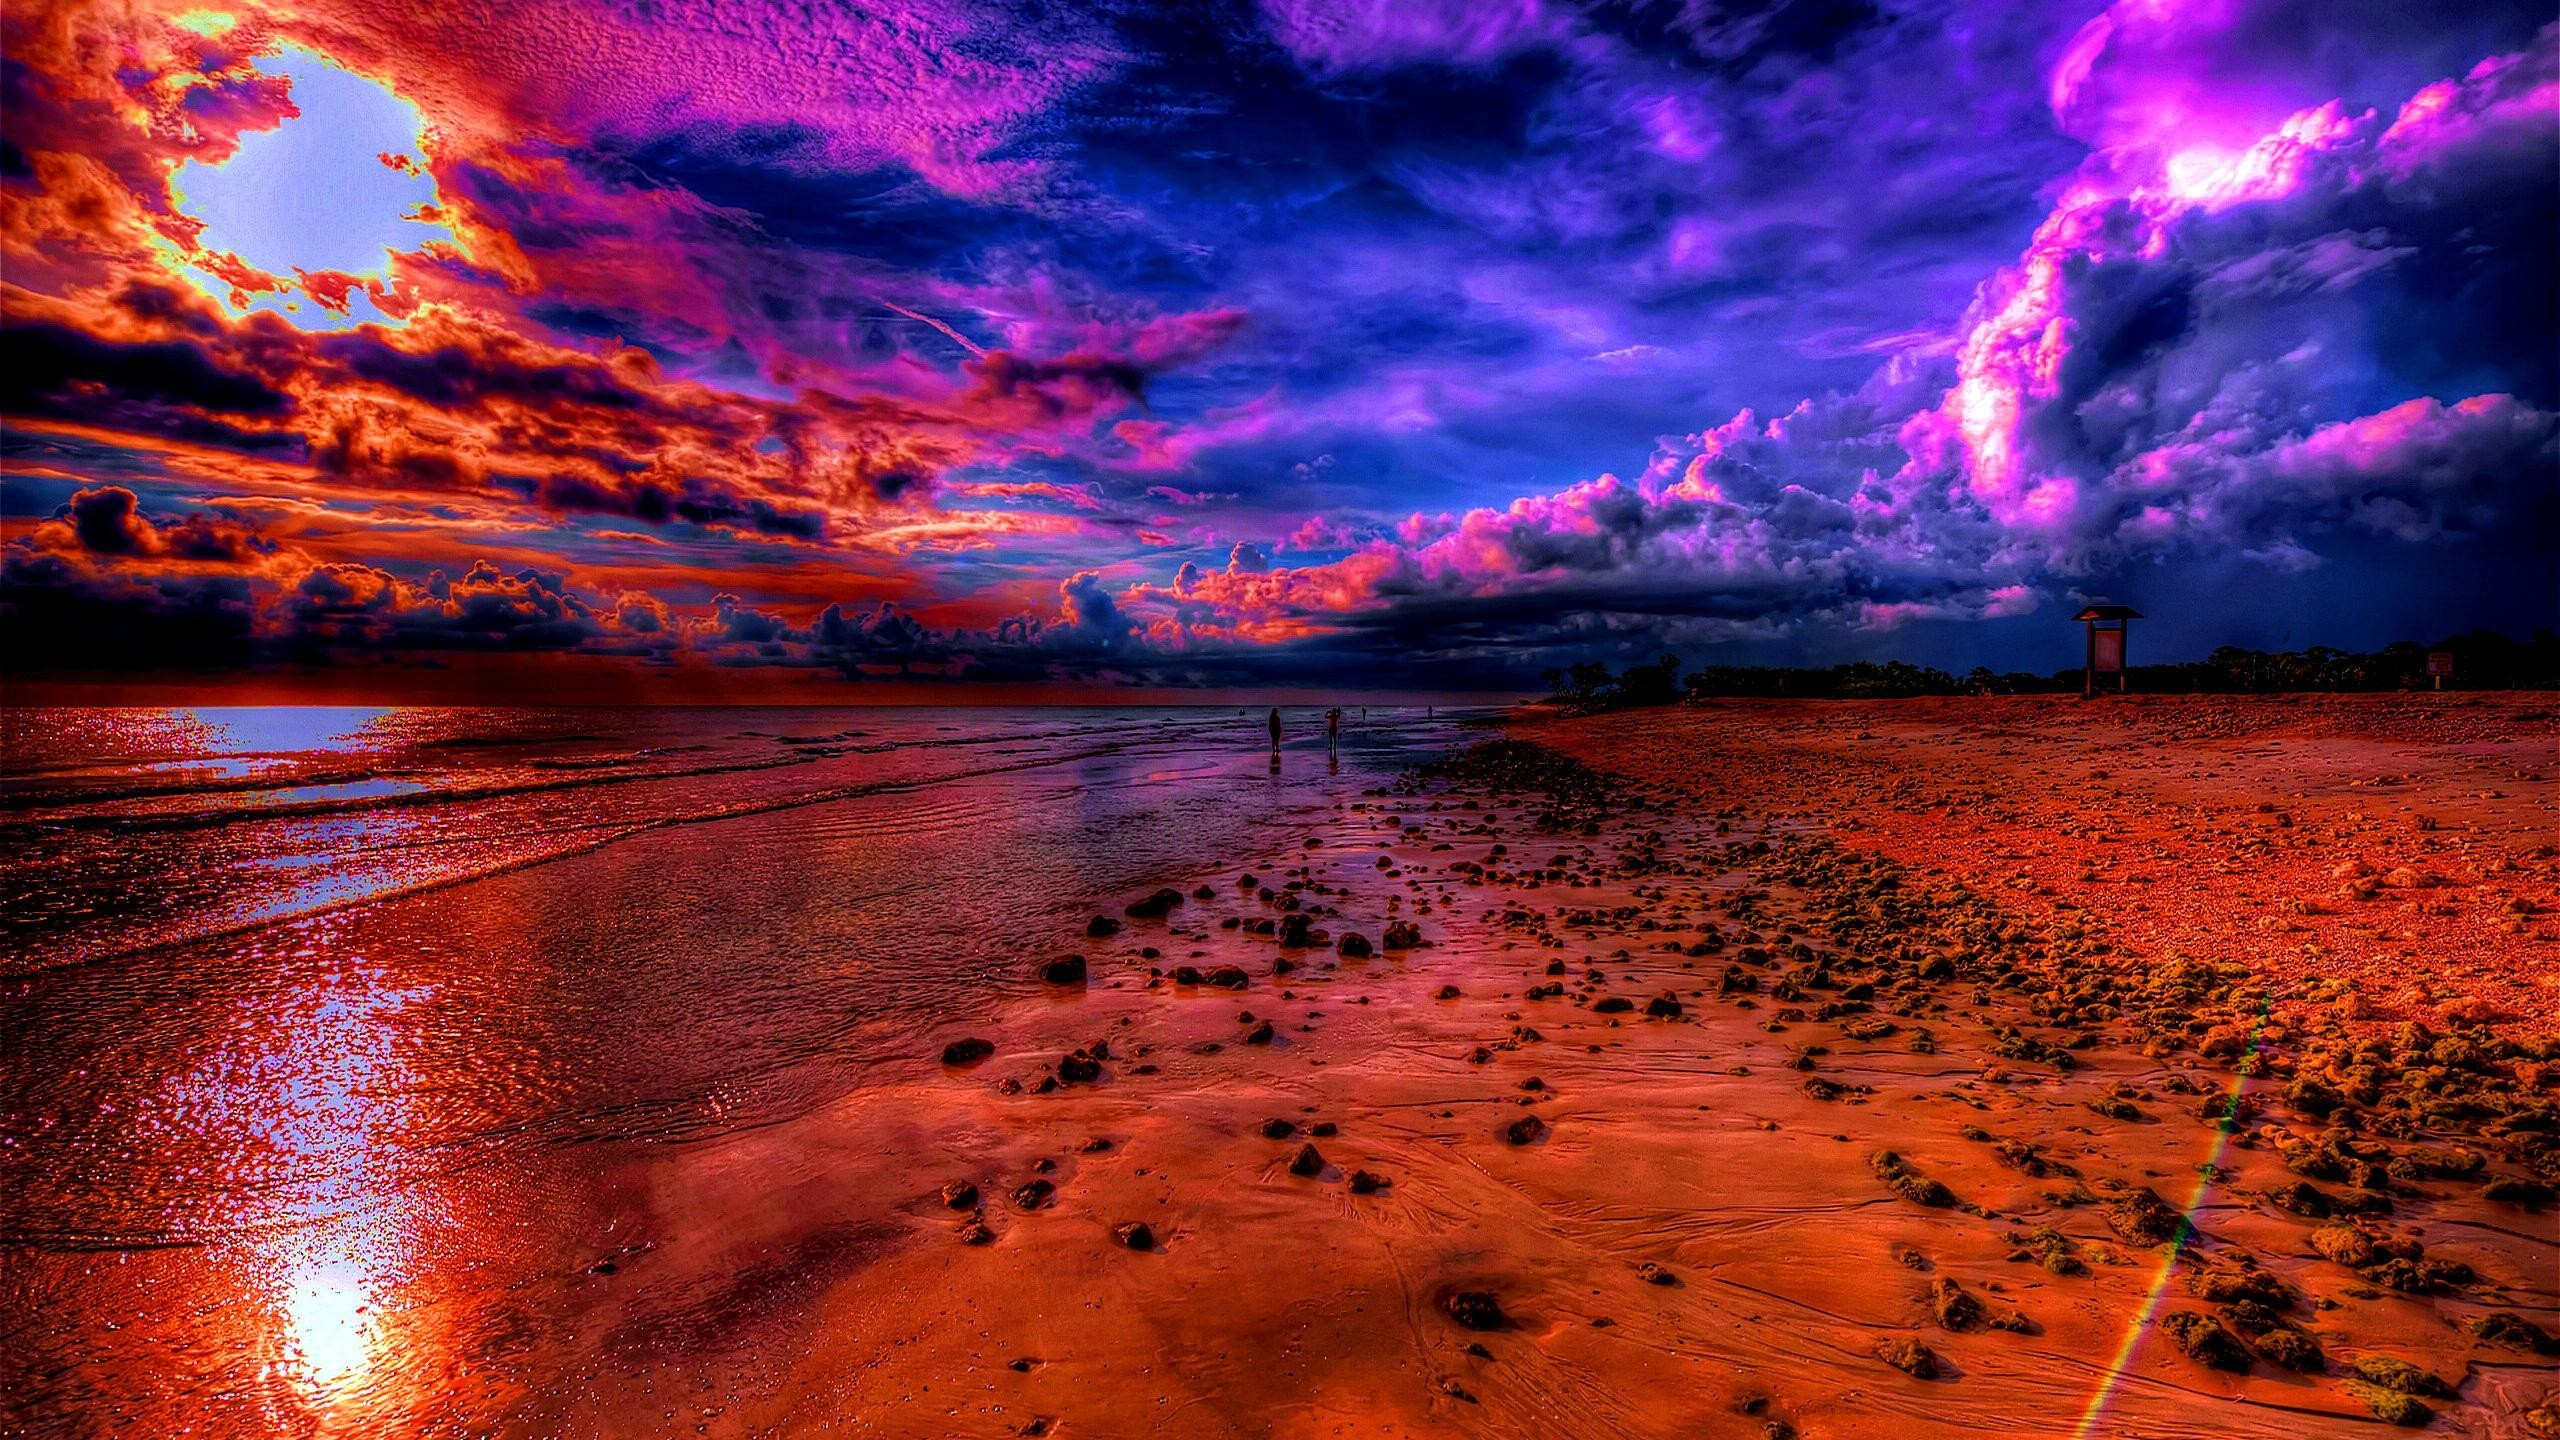 Sunset Sky Over Beach Fondo De Pantalla HD